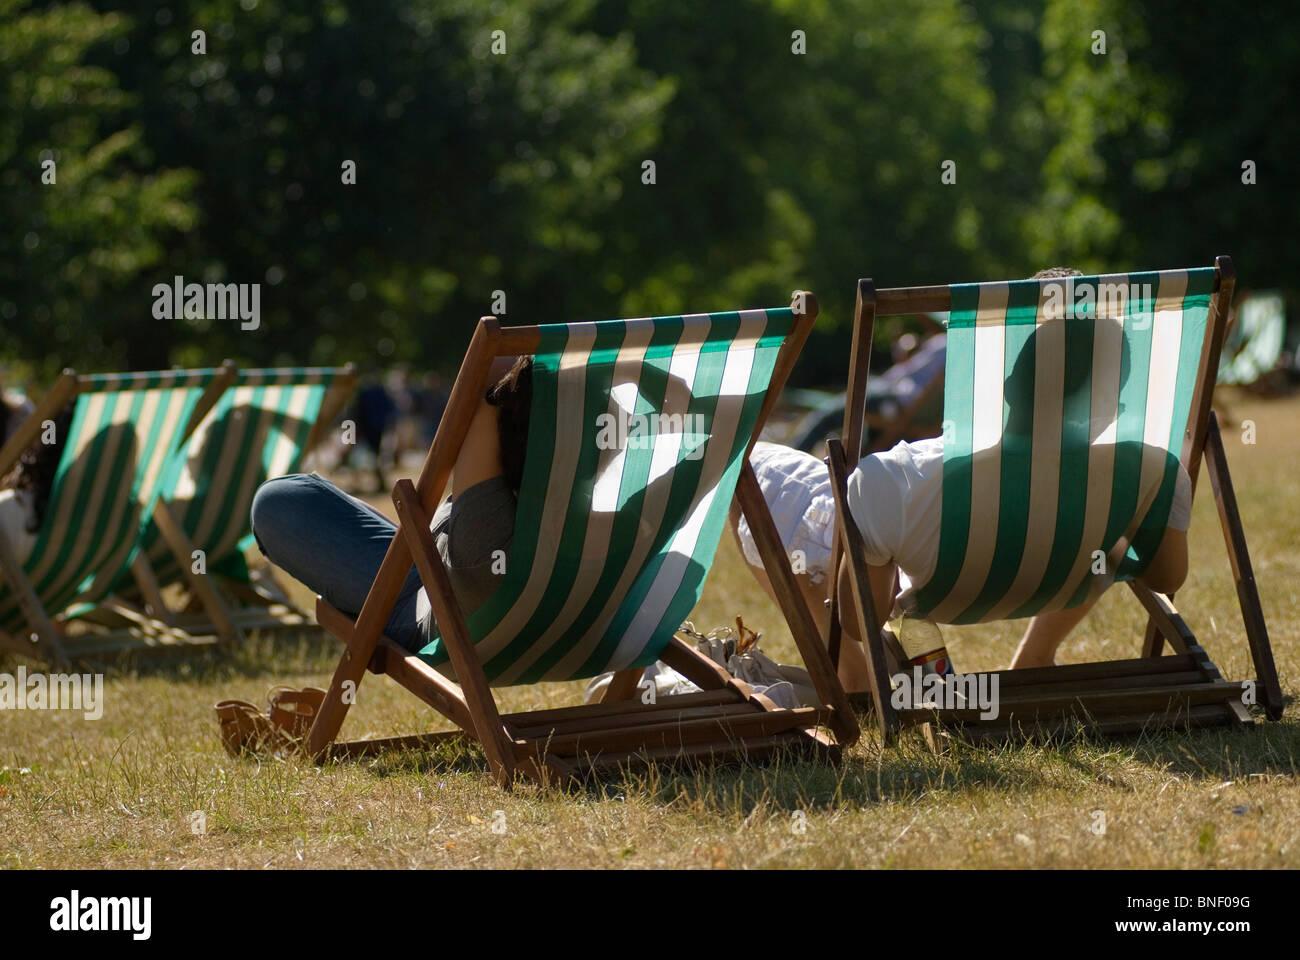 Heat wave hot weather couple deckchairs Hyde Park London Uk - Stock Image